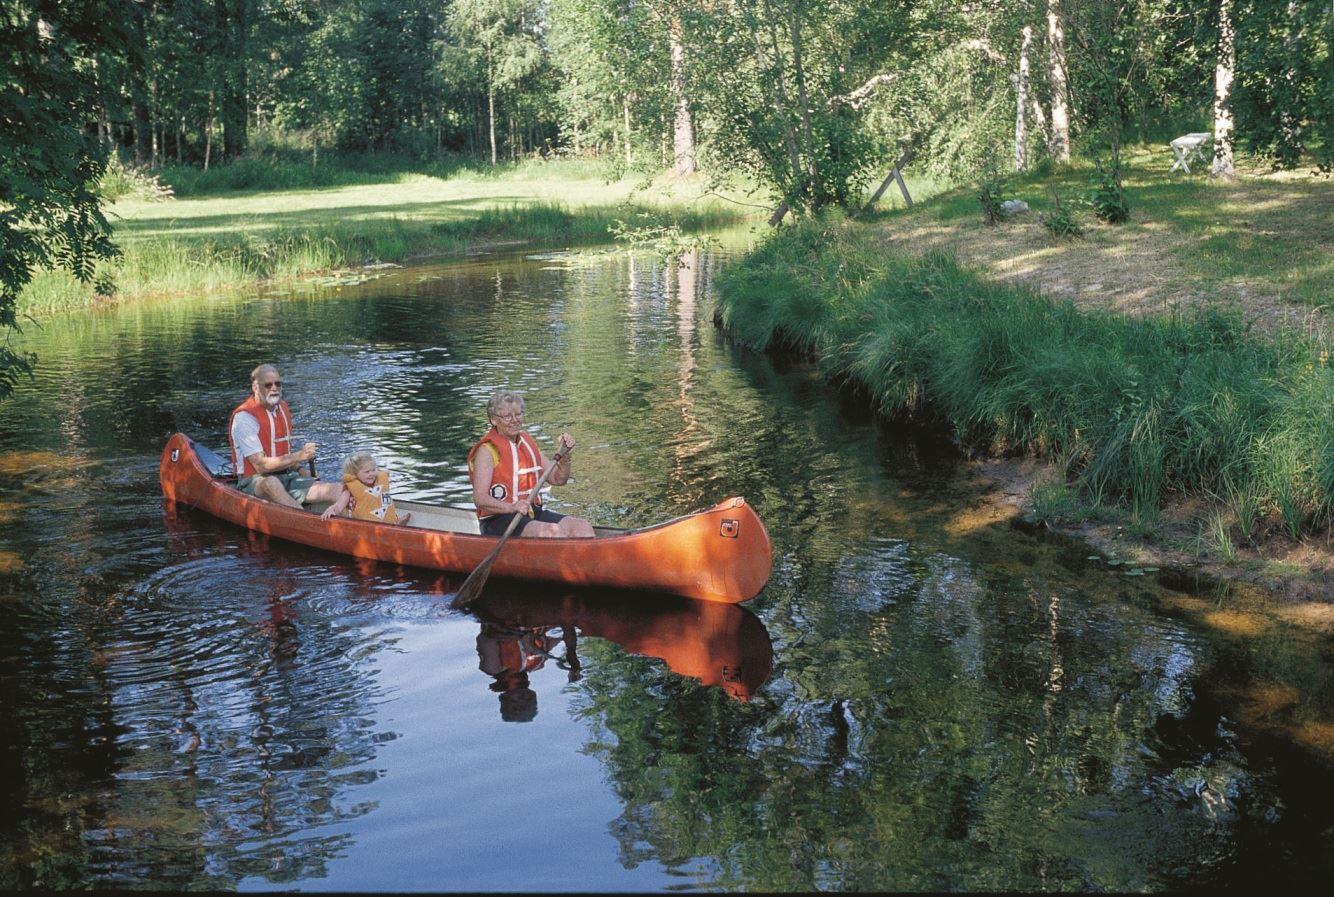 Arne Johansson, Tour suggestions canoe: Johannisholm - Finn Bodarna 17km